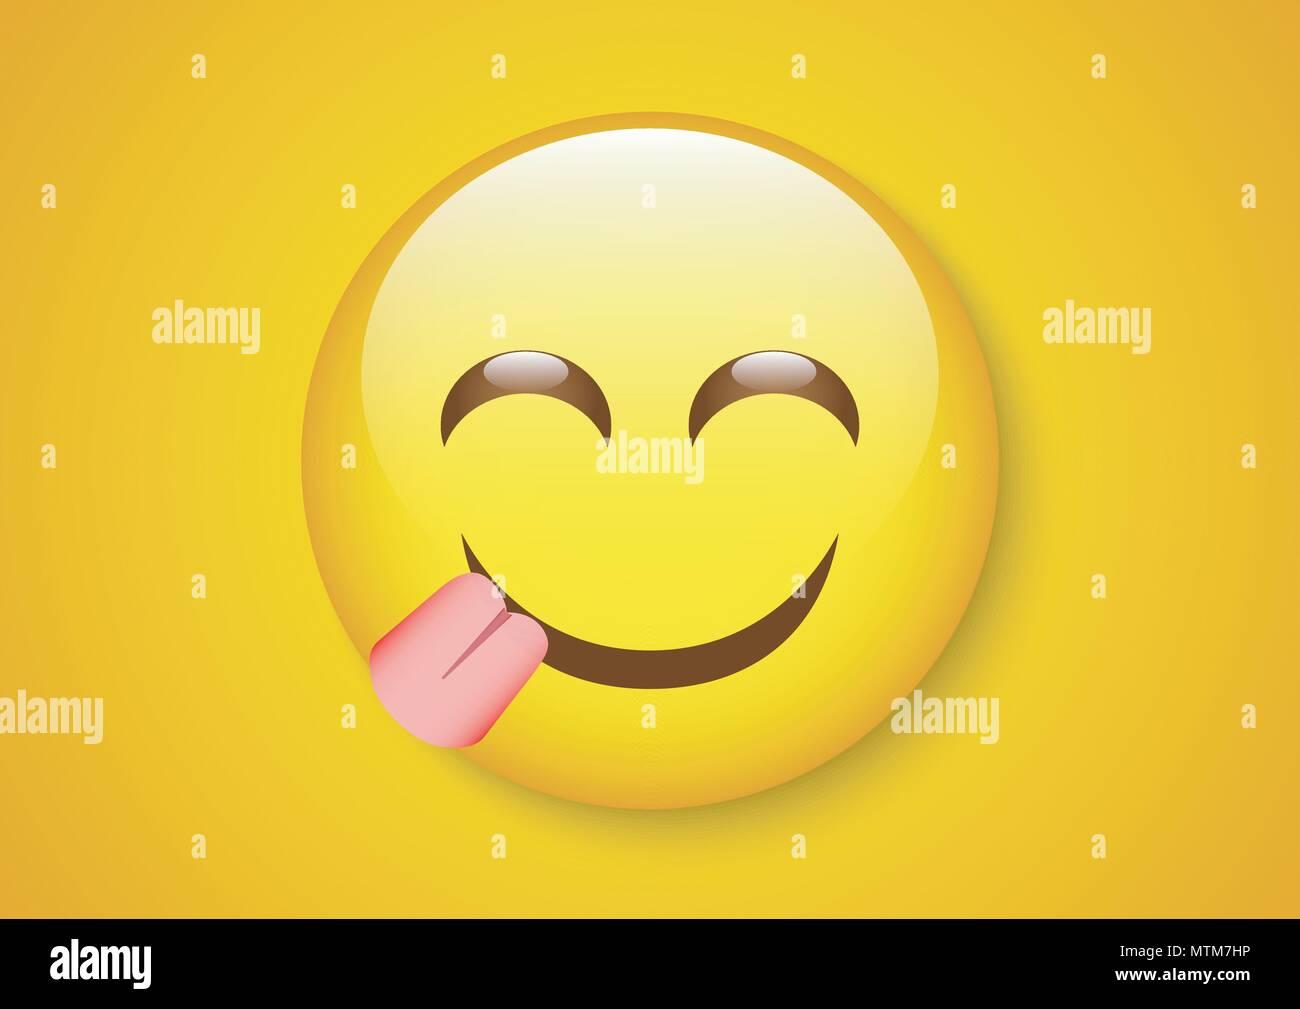 Vector Design Of Emoticon Expression Yummy Face Stock Vector Art